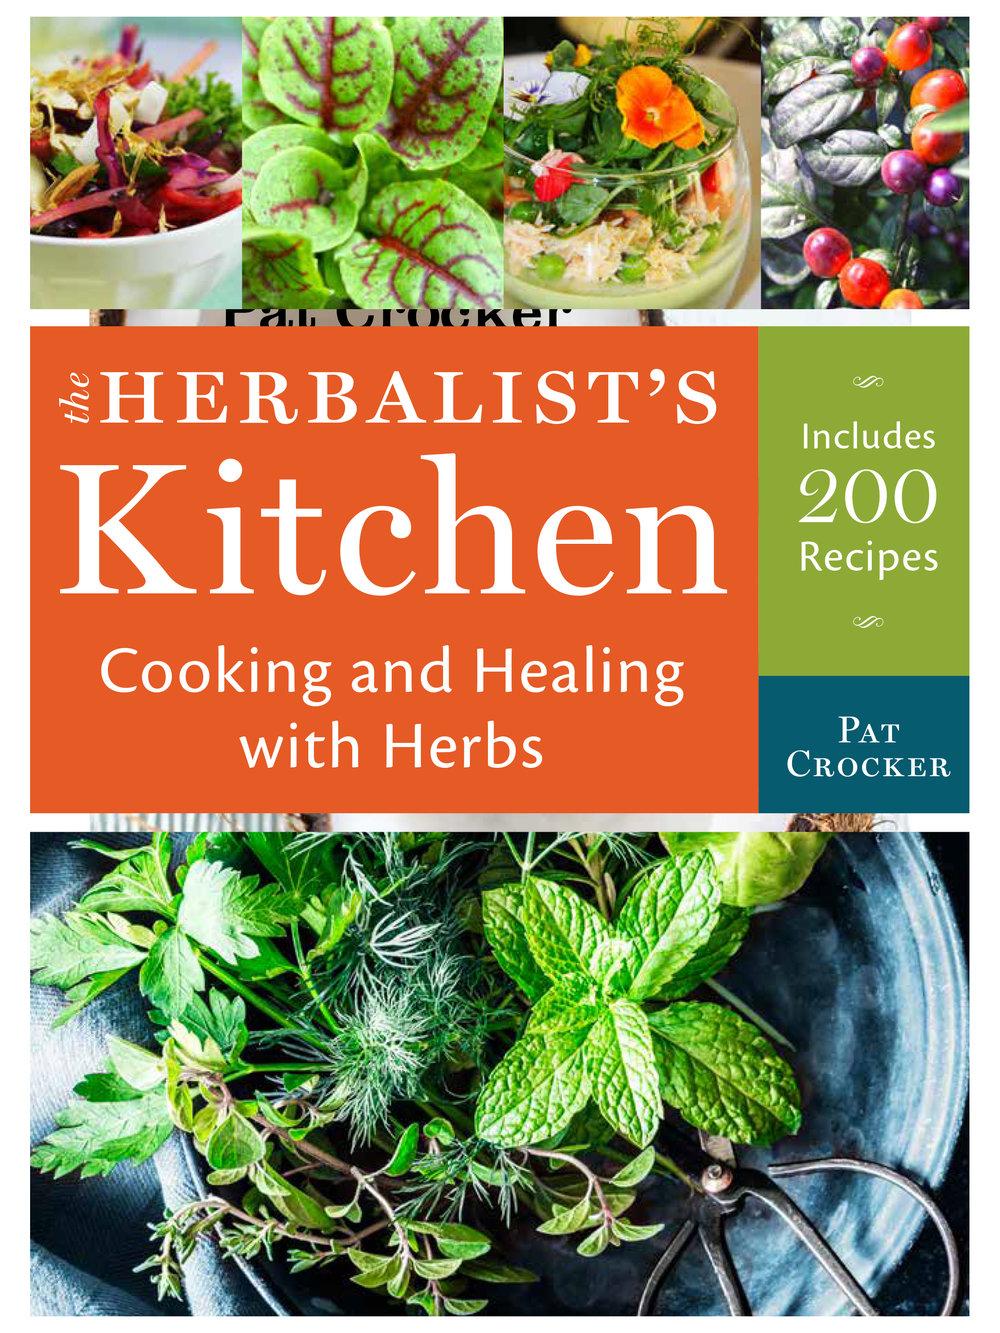 The Herbalist's Kitchen by Pat Crocker